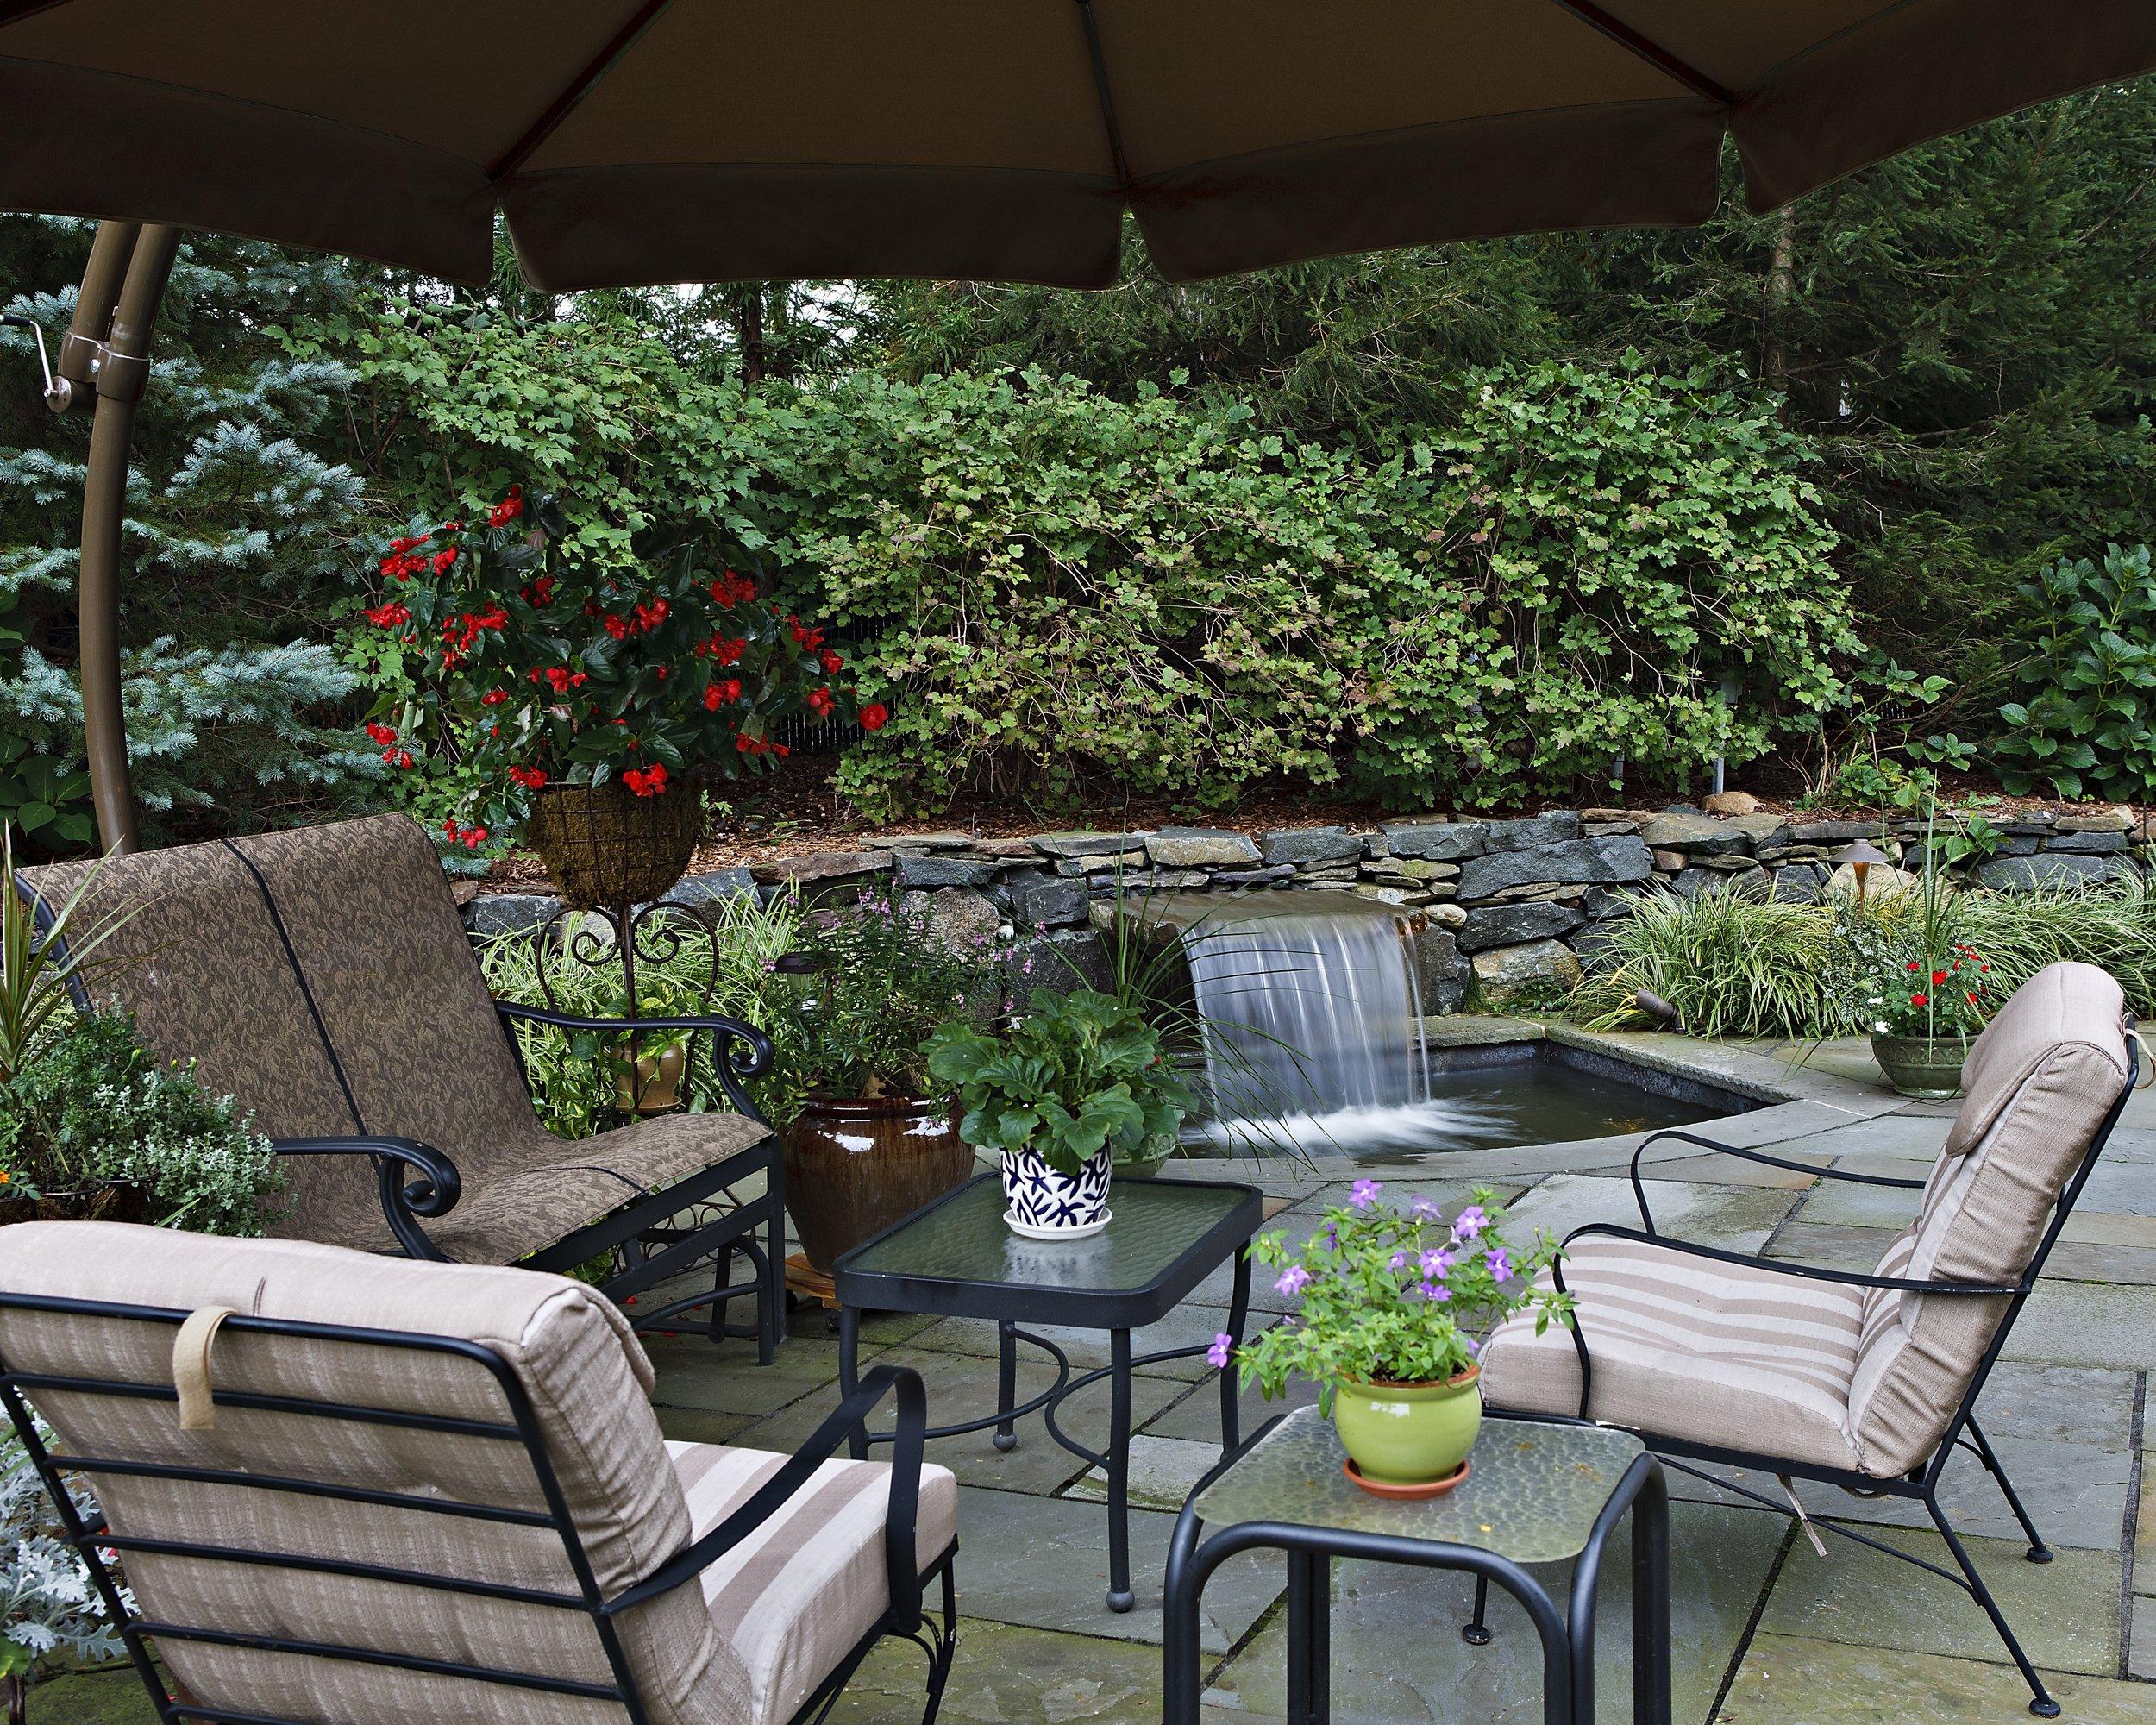 Landscape Design in Old Tappan, Norwood, Northvale, Harrington Park, Closter, Alpine, Cresskill, Tenafly, Rivervale,Park Ridge, Montvale